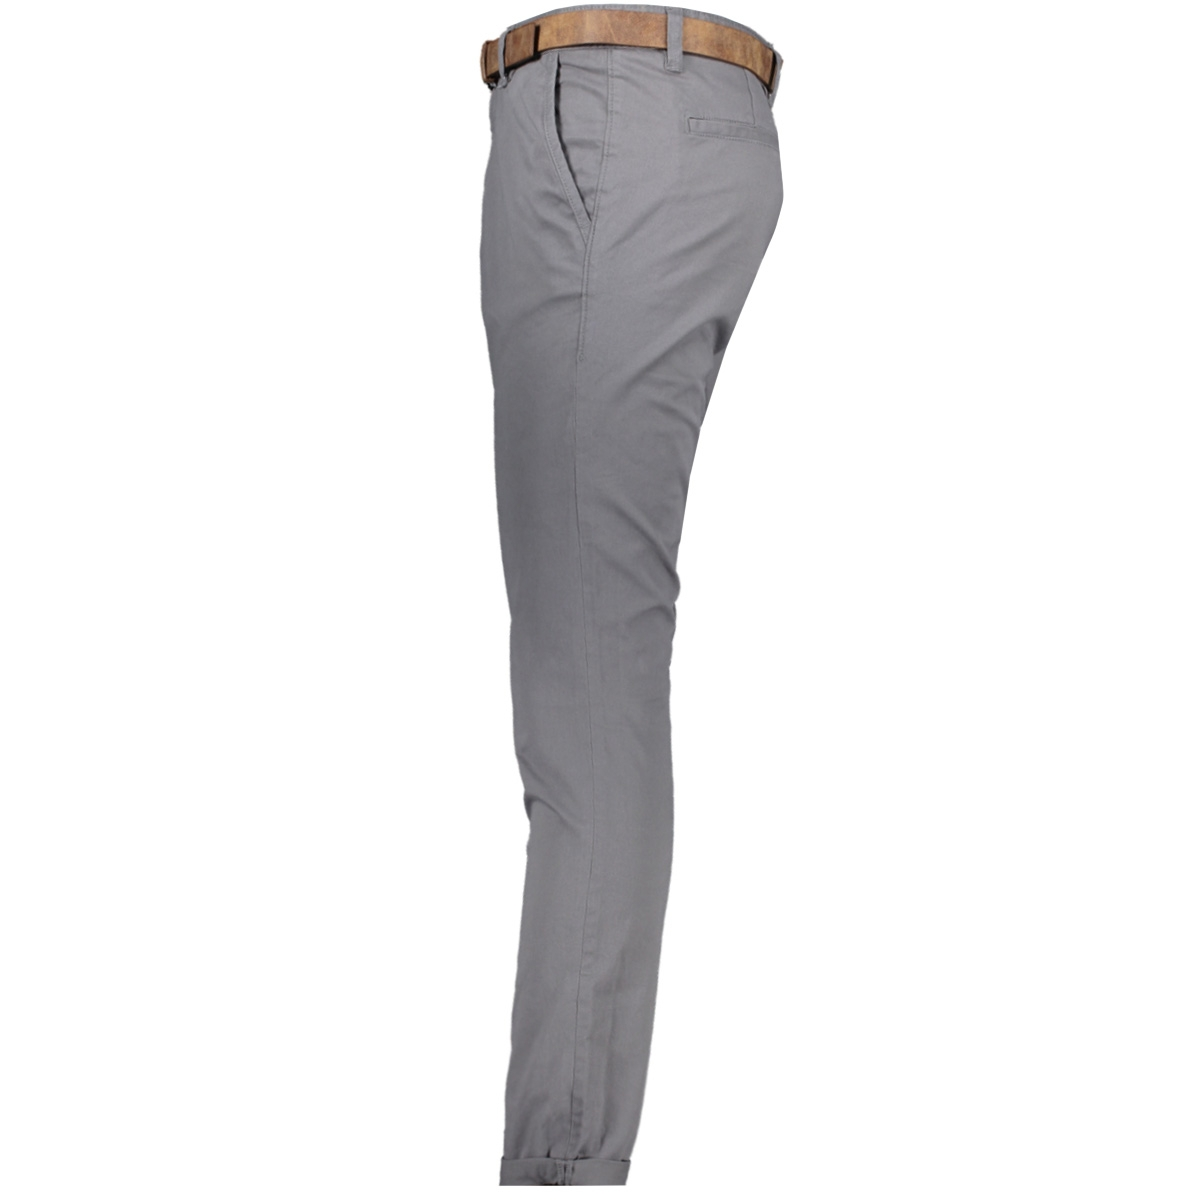 chino broek met riem 1008253xx12 tom tailor broek 10952